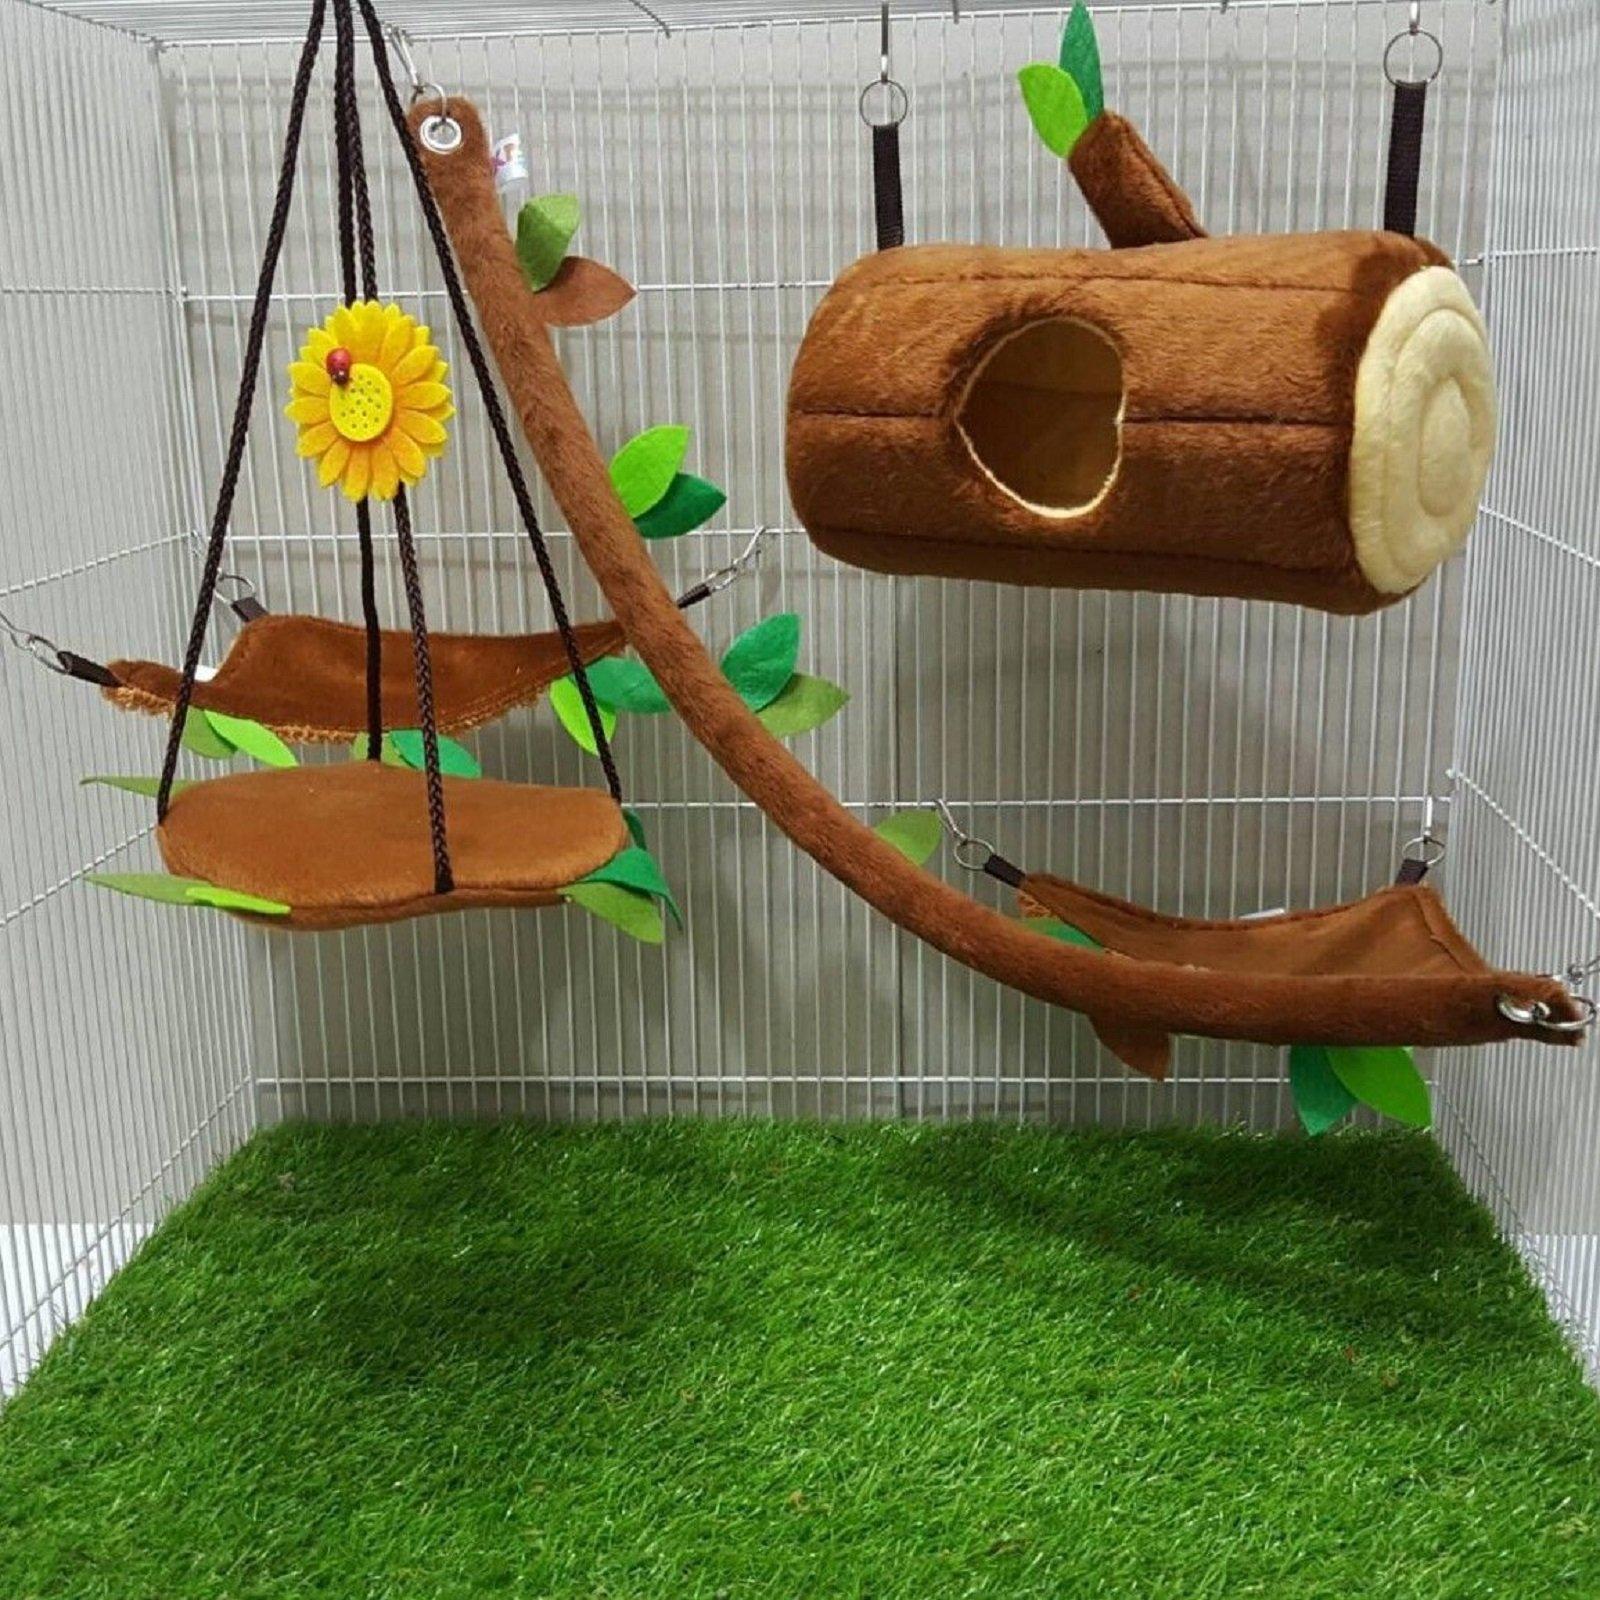 5 Pcs Sugar Glider Hamster Squirrel Chinchillas Small Pet Light Brown Log Cage Set Forest Pattern Get Free 1 Small Pet Treats, Polar Bear's Republic